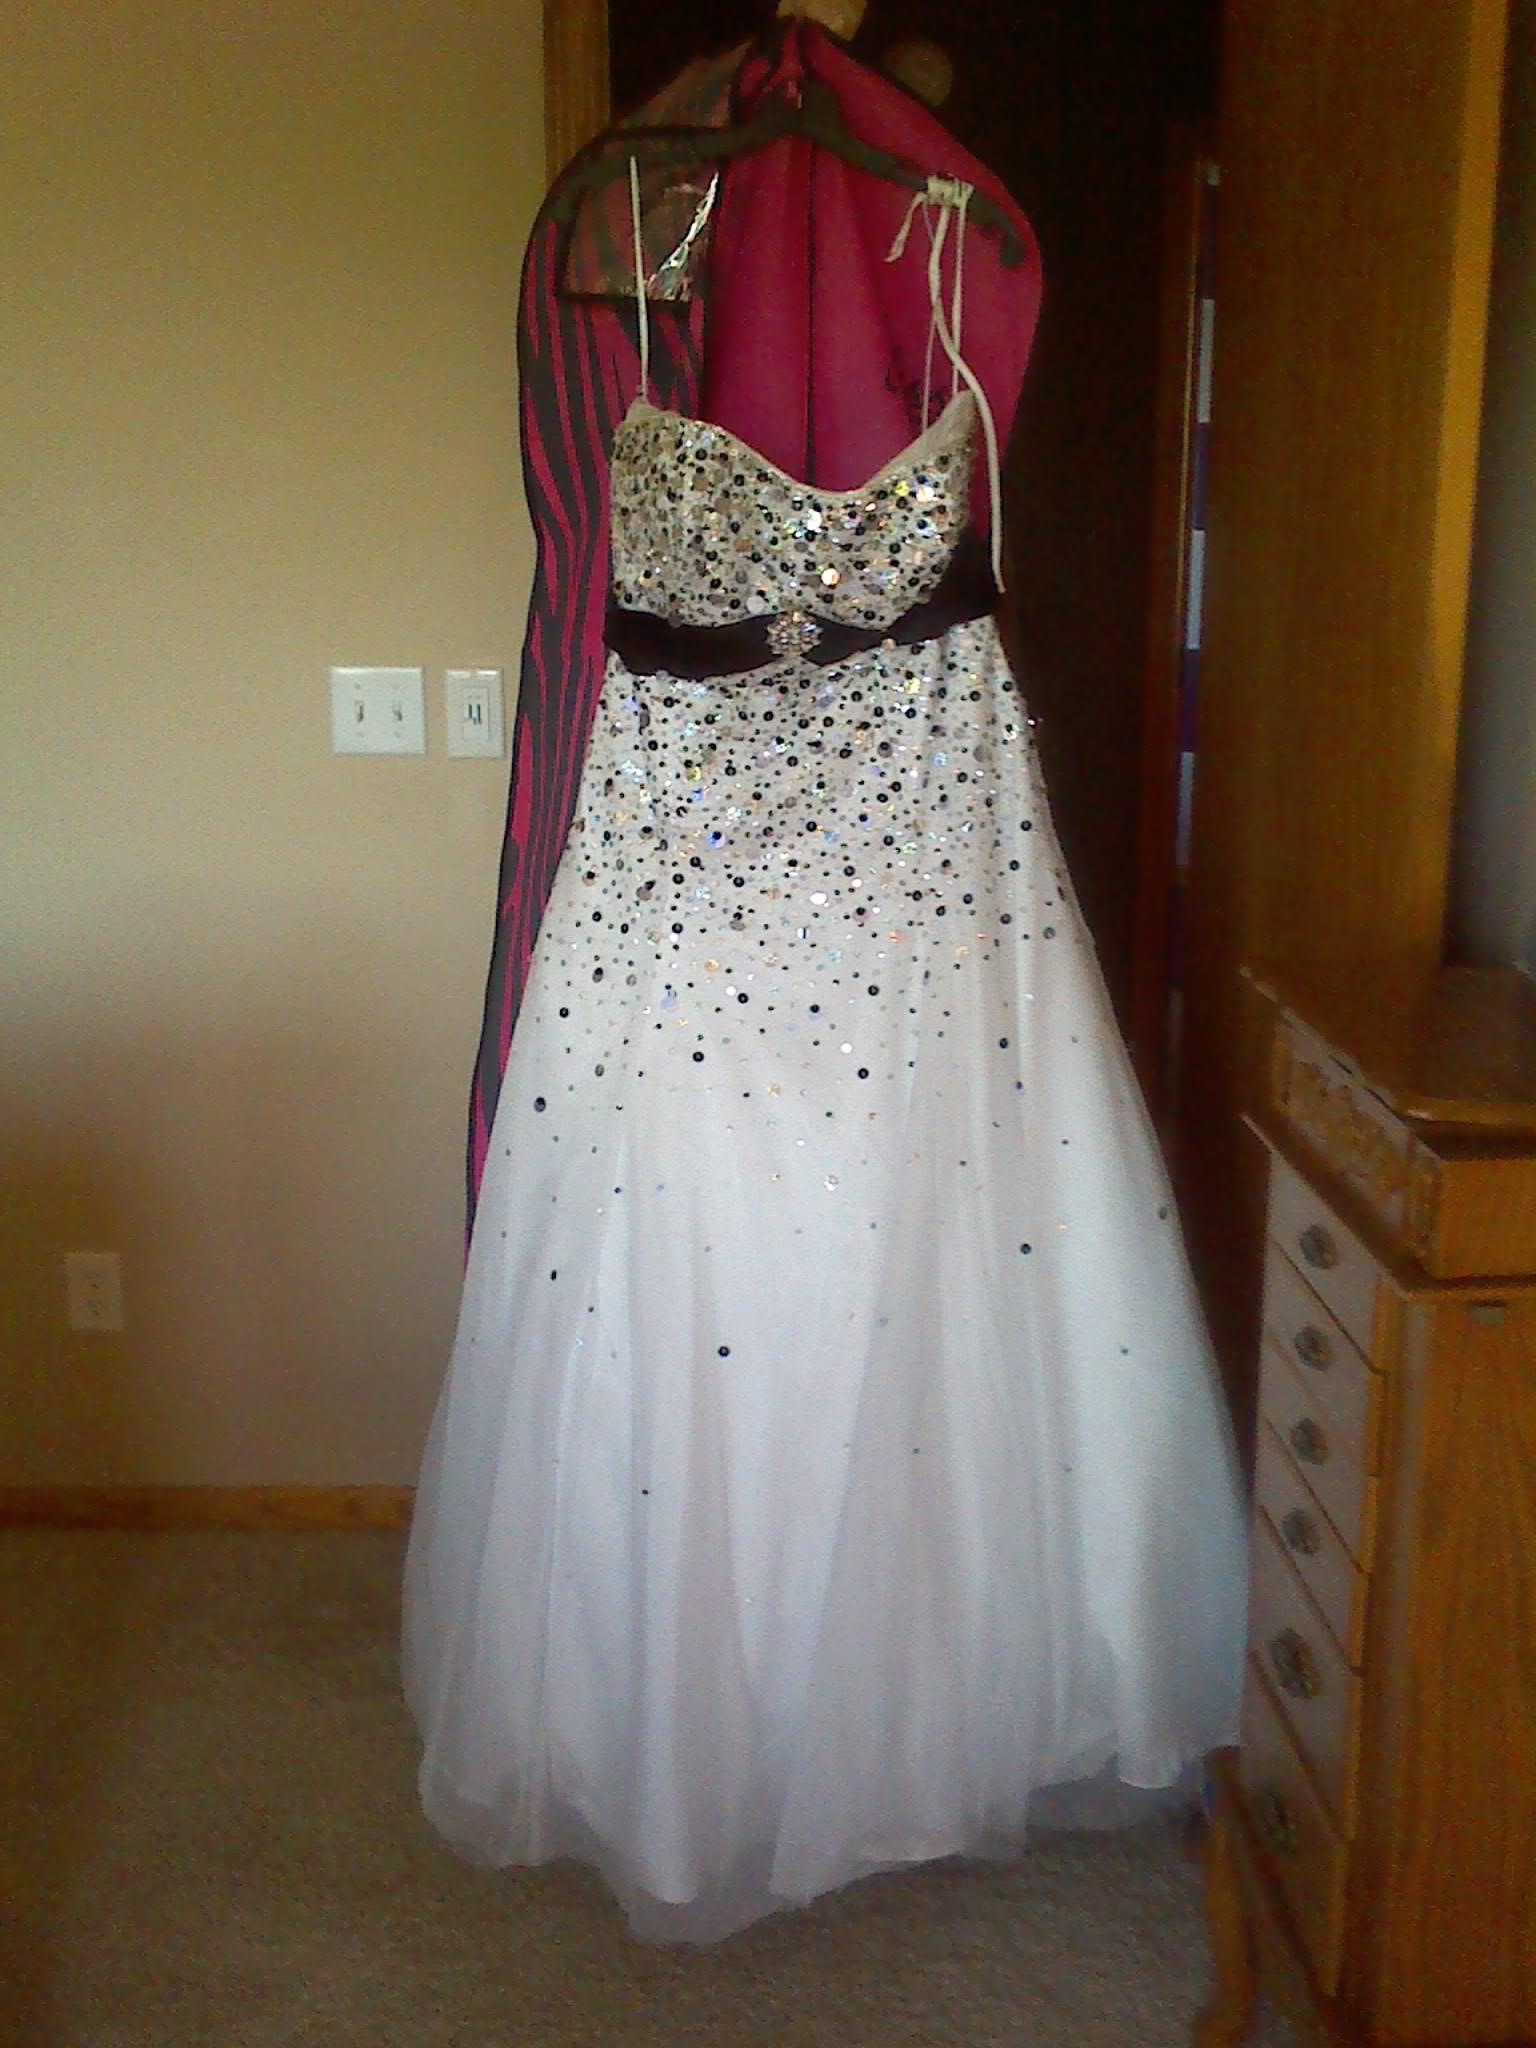 2013 Liz Fields Black/White Strapless Prom Dress